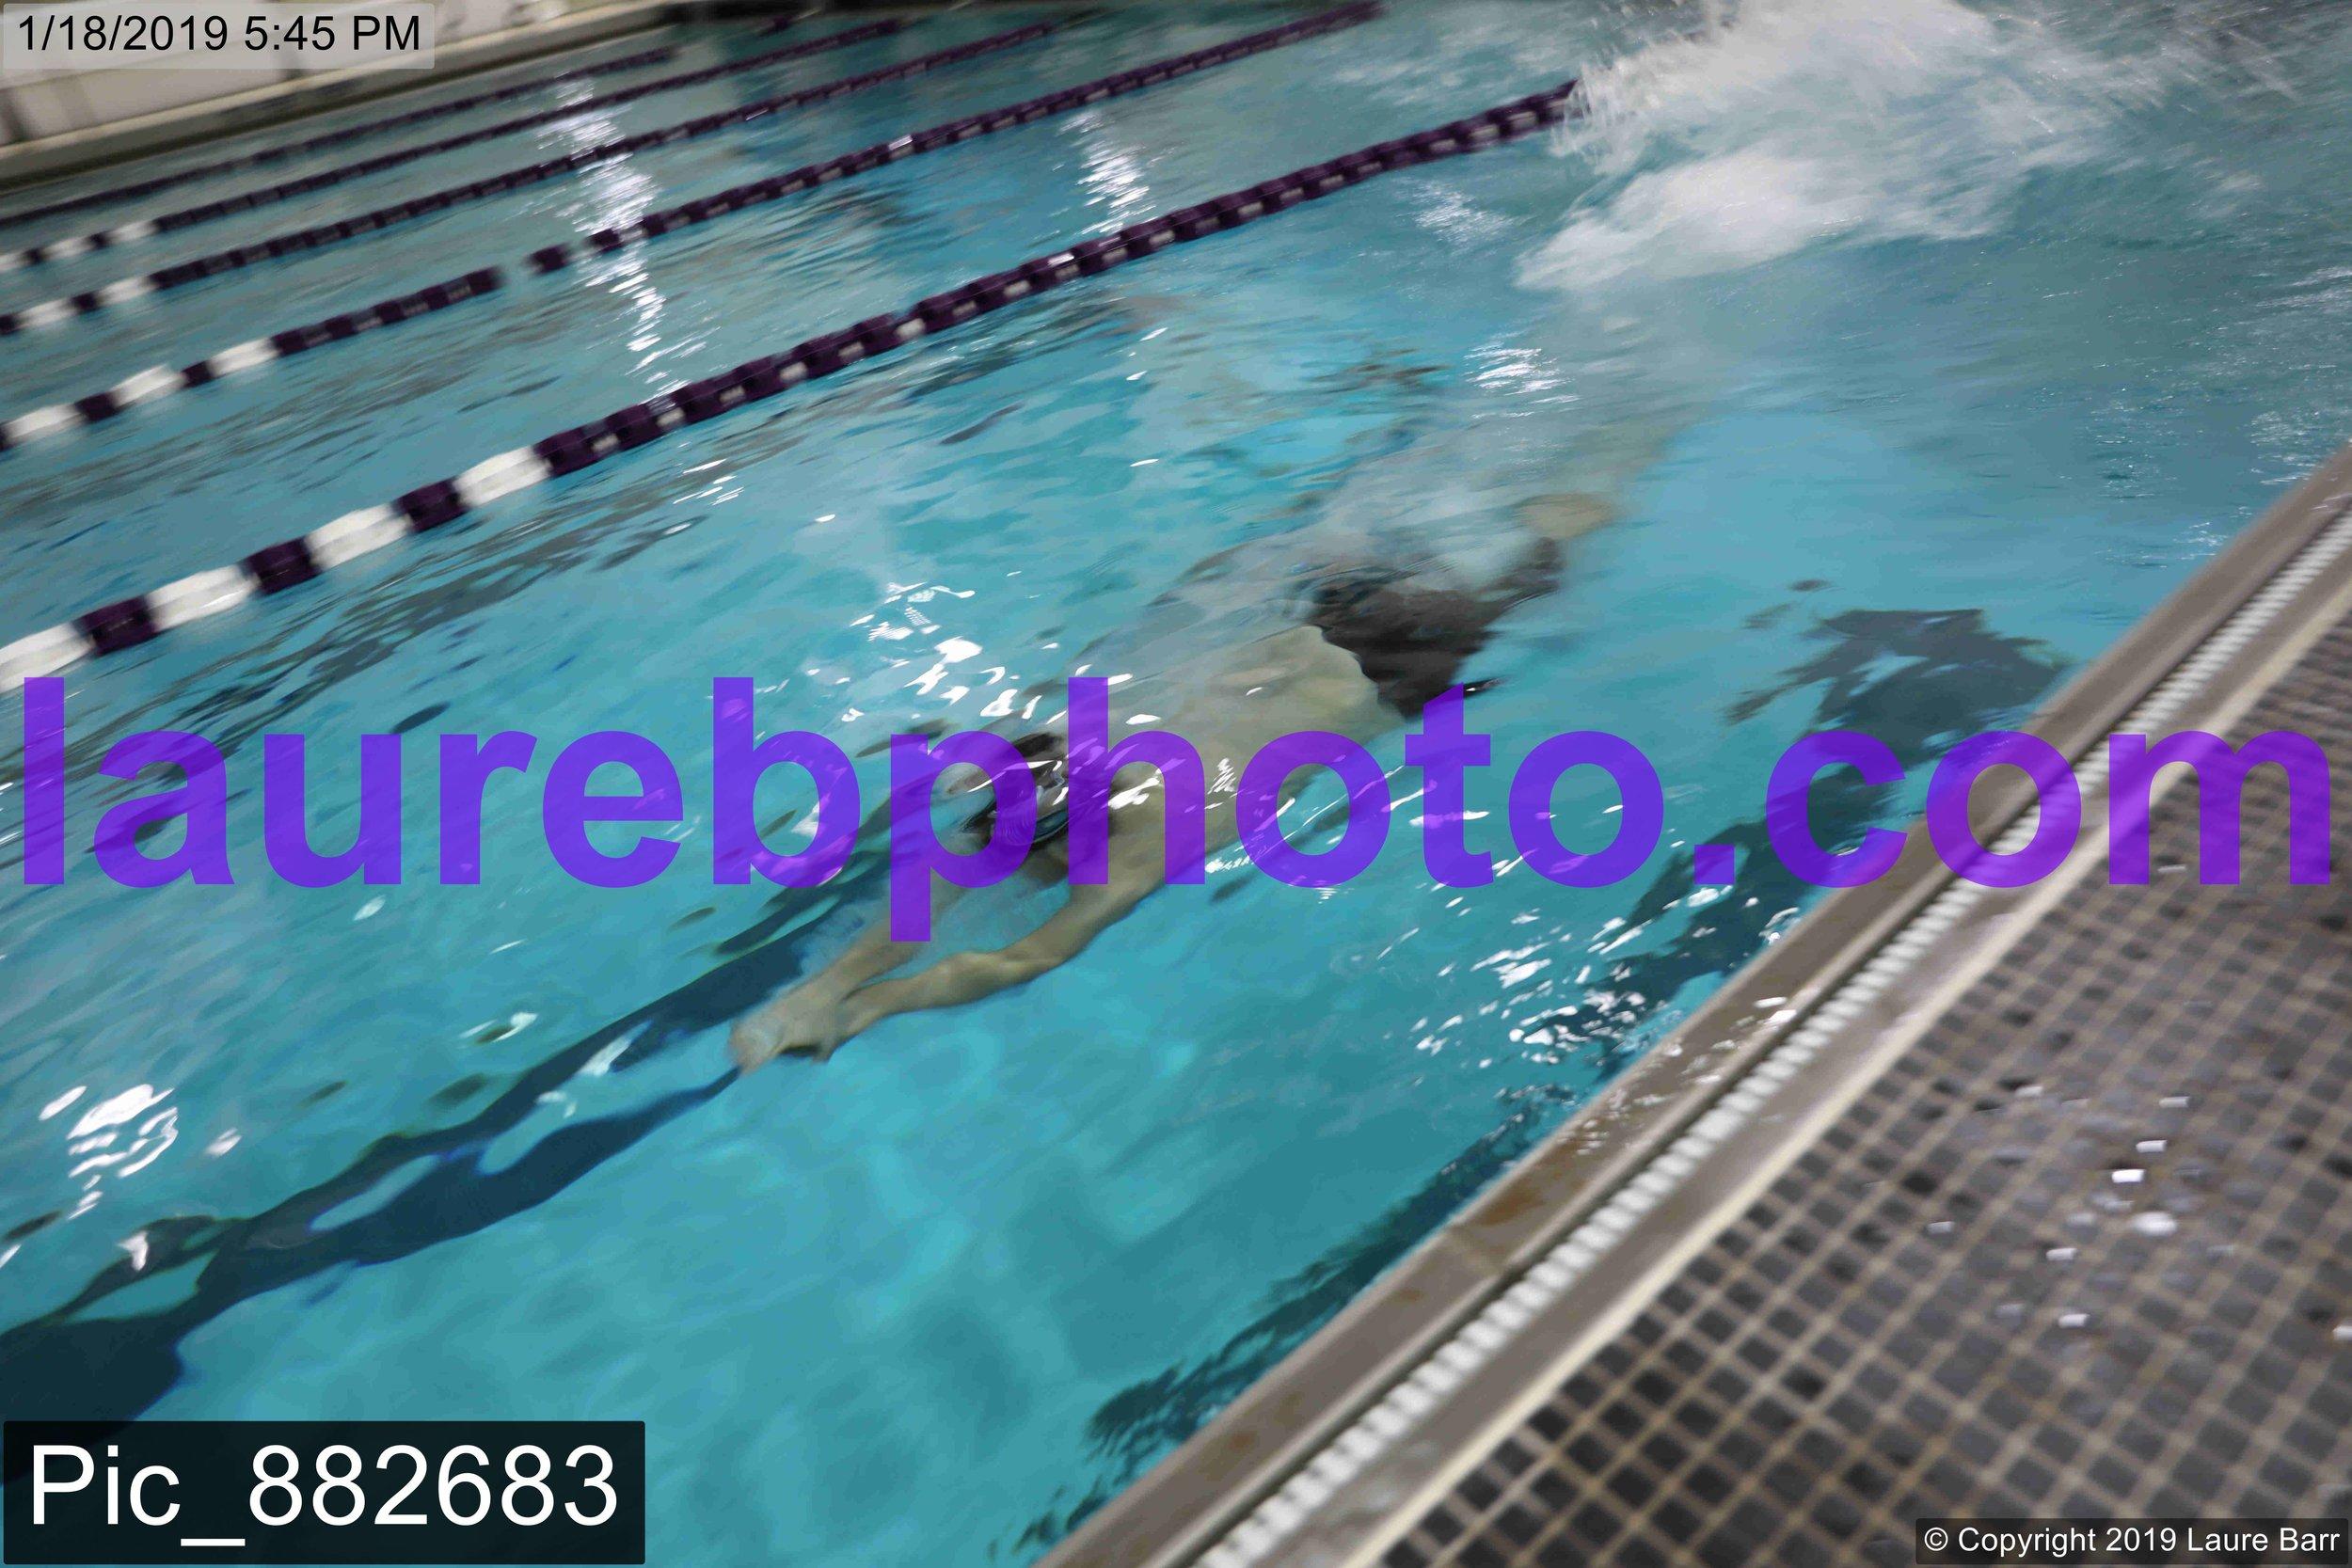 Pic_882683.jpg